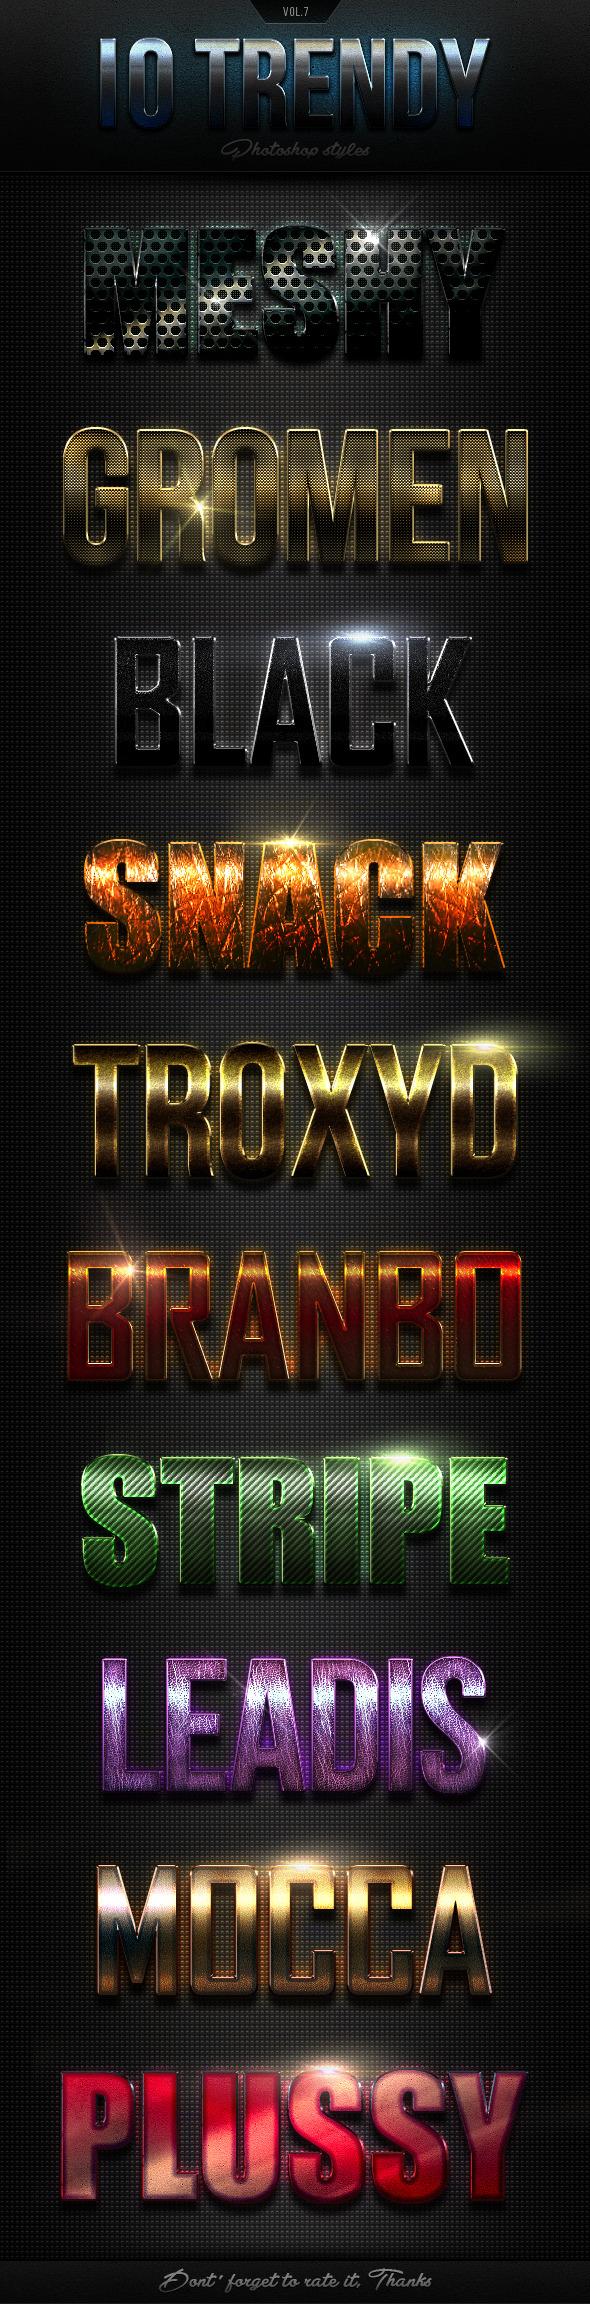 GraphicRiver 12 Trendy Photoshop Styles Vol.7 10775259